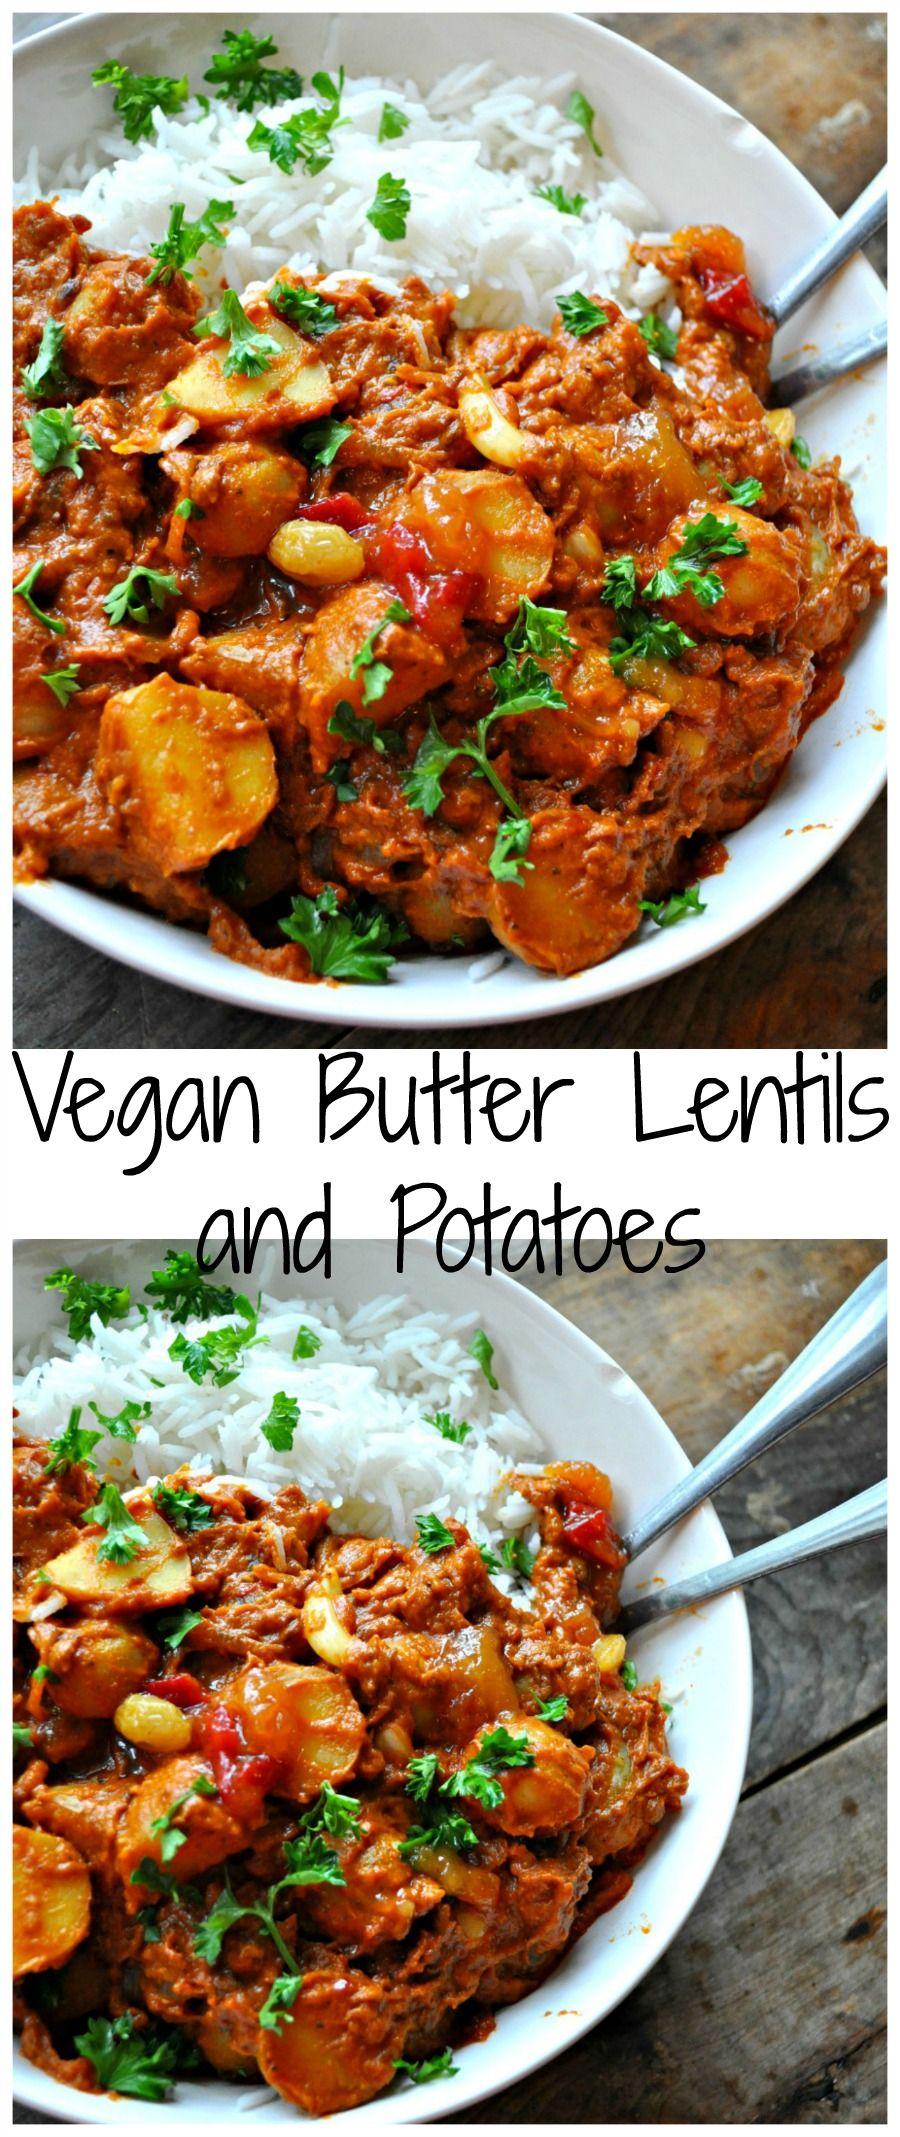 Vegan Butter Lentils and Potatoes images